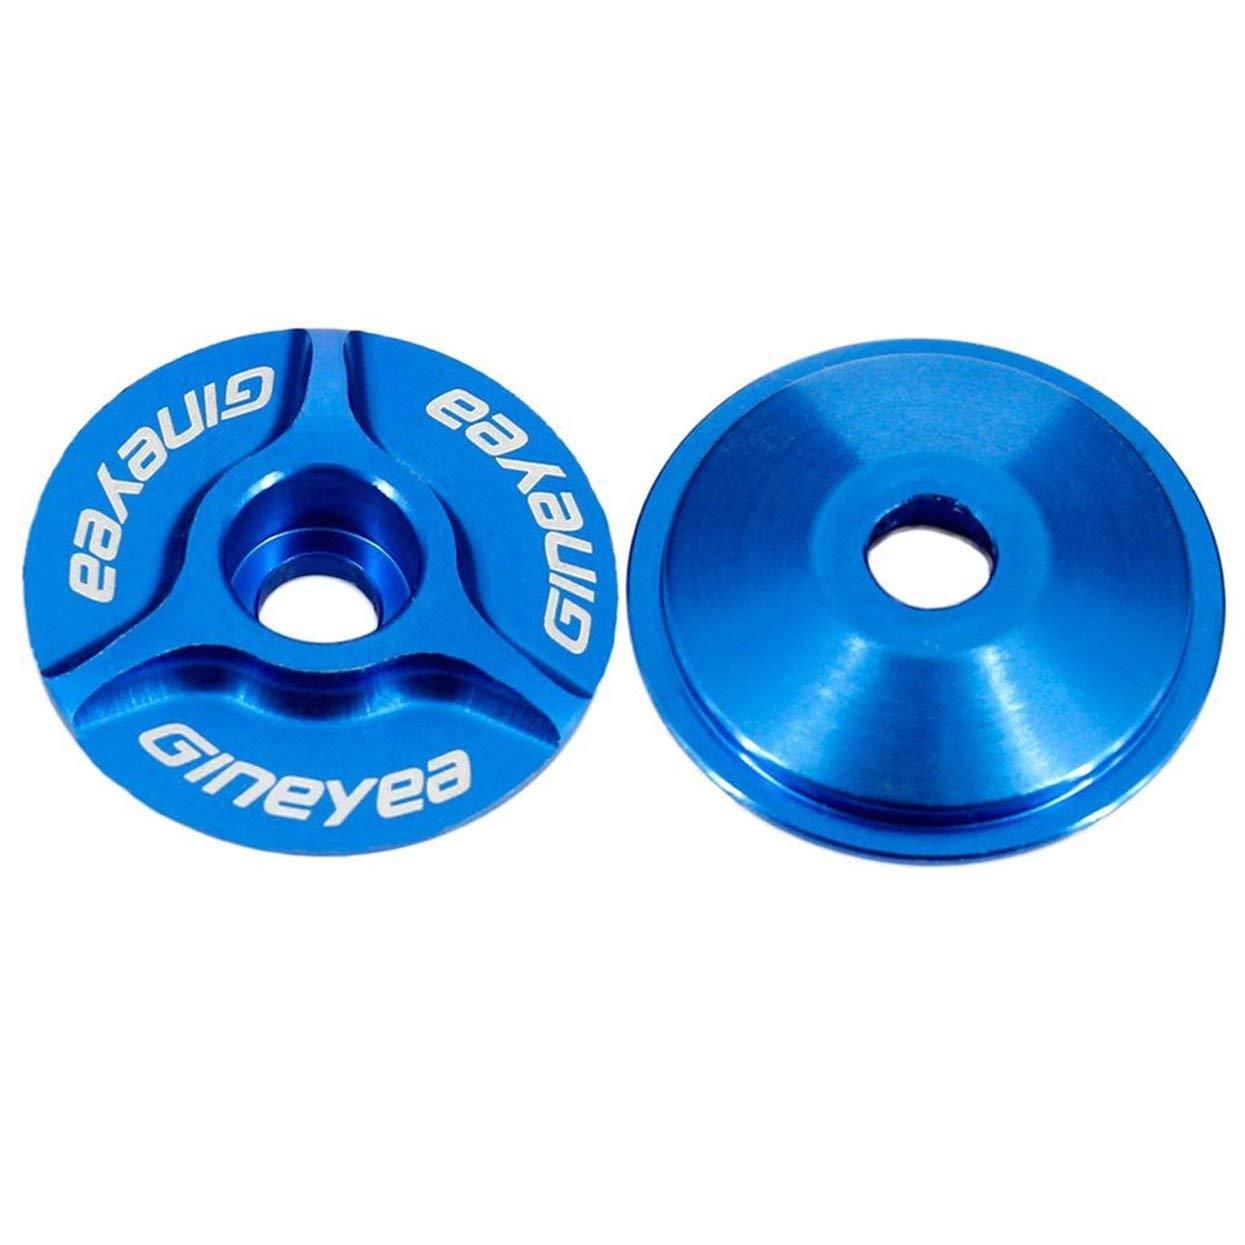 Blu 1pc Leggero Portatile in Alluminio 1 1//8 MTB Bike Stelo da Bici CNC Headset Top cap Cover Pratico e Resistente